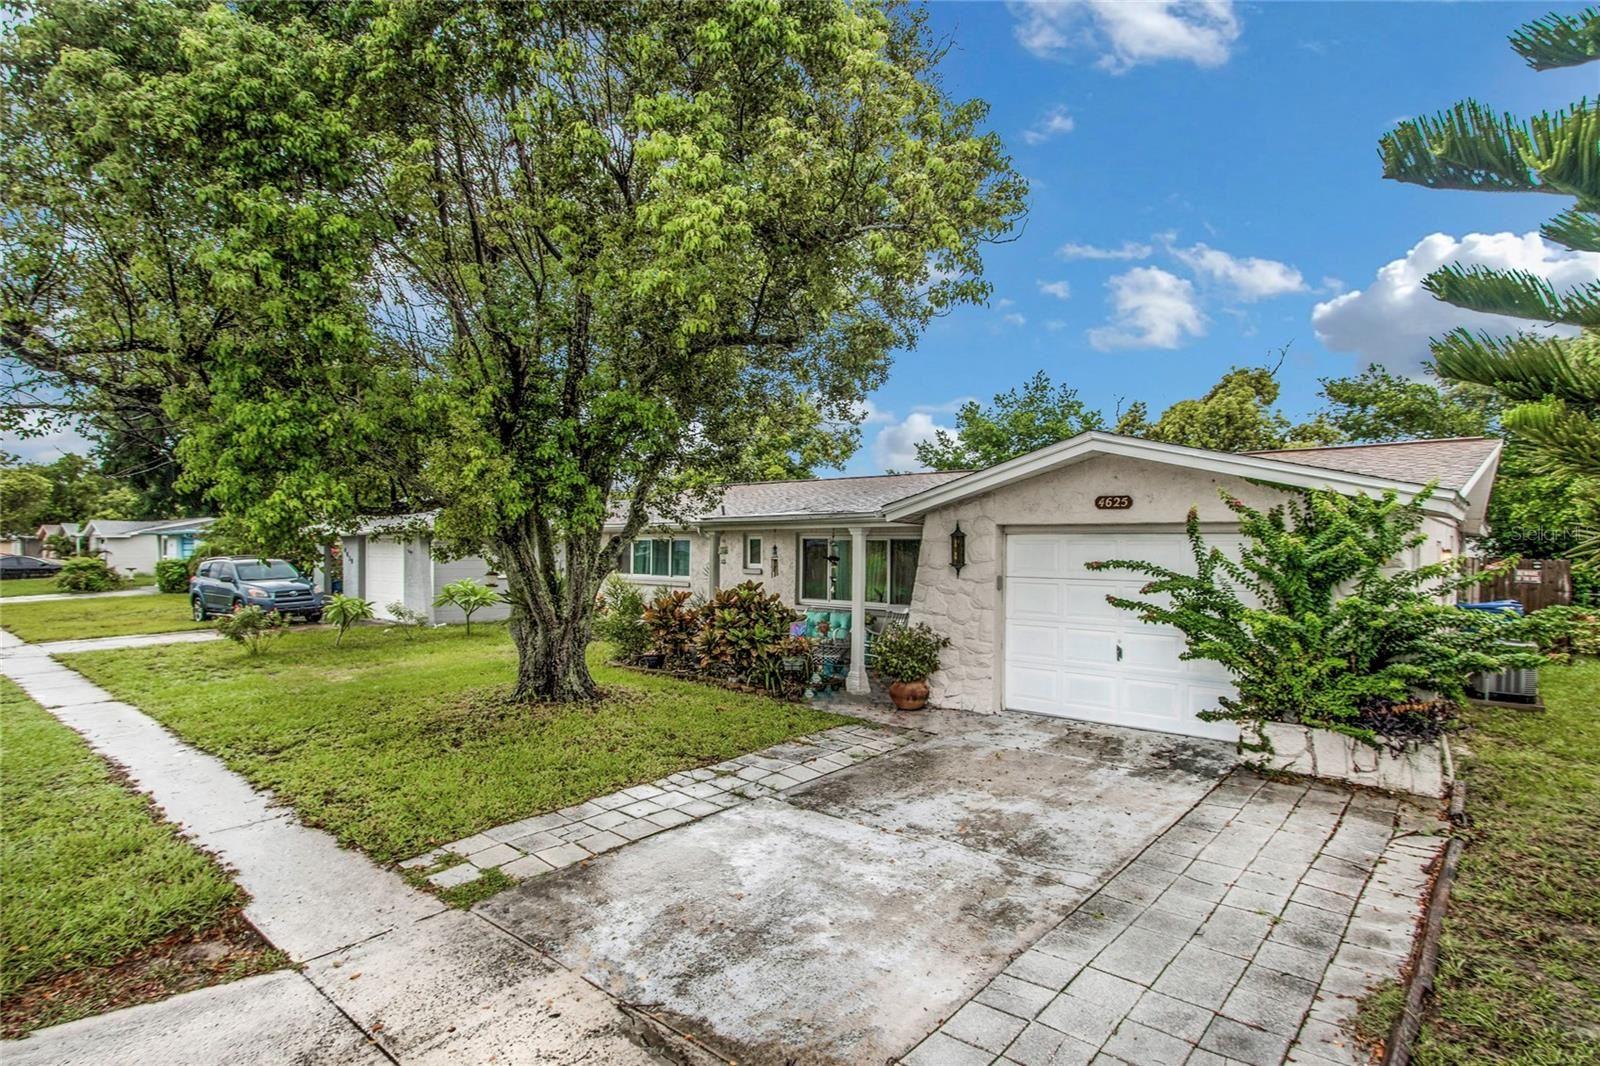 4625 MADISON STREET, New Port Richey, FL 34652 - #: U8132204